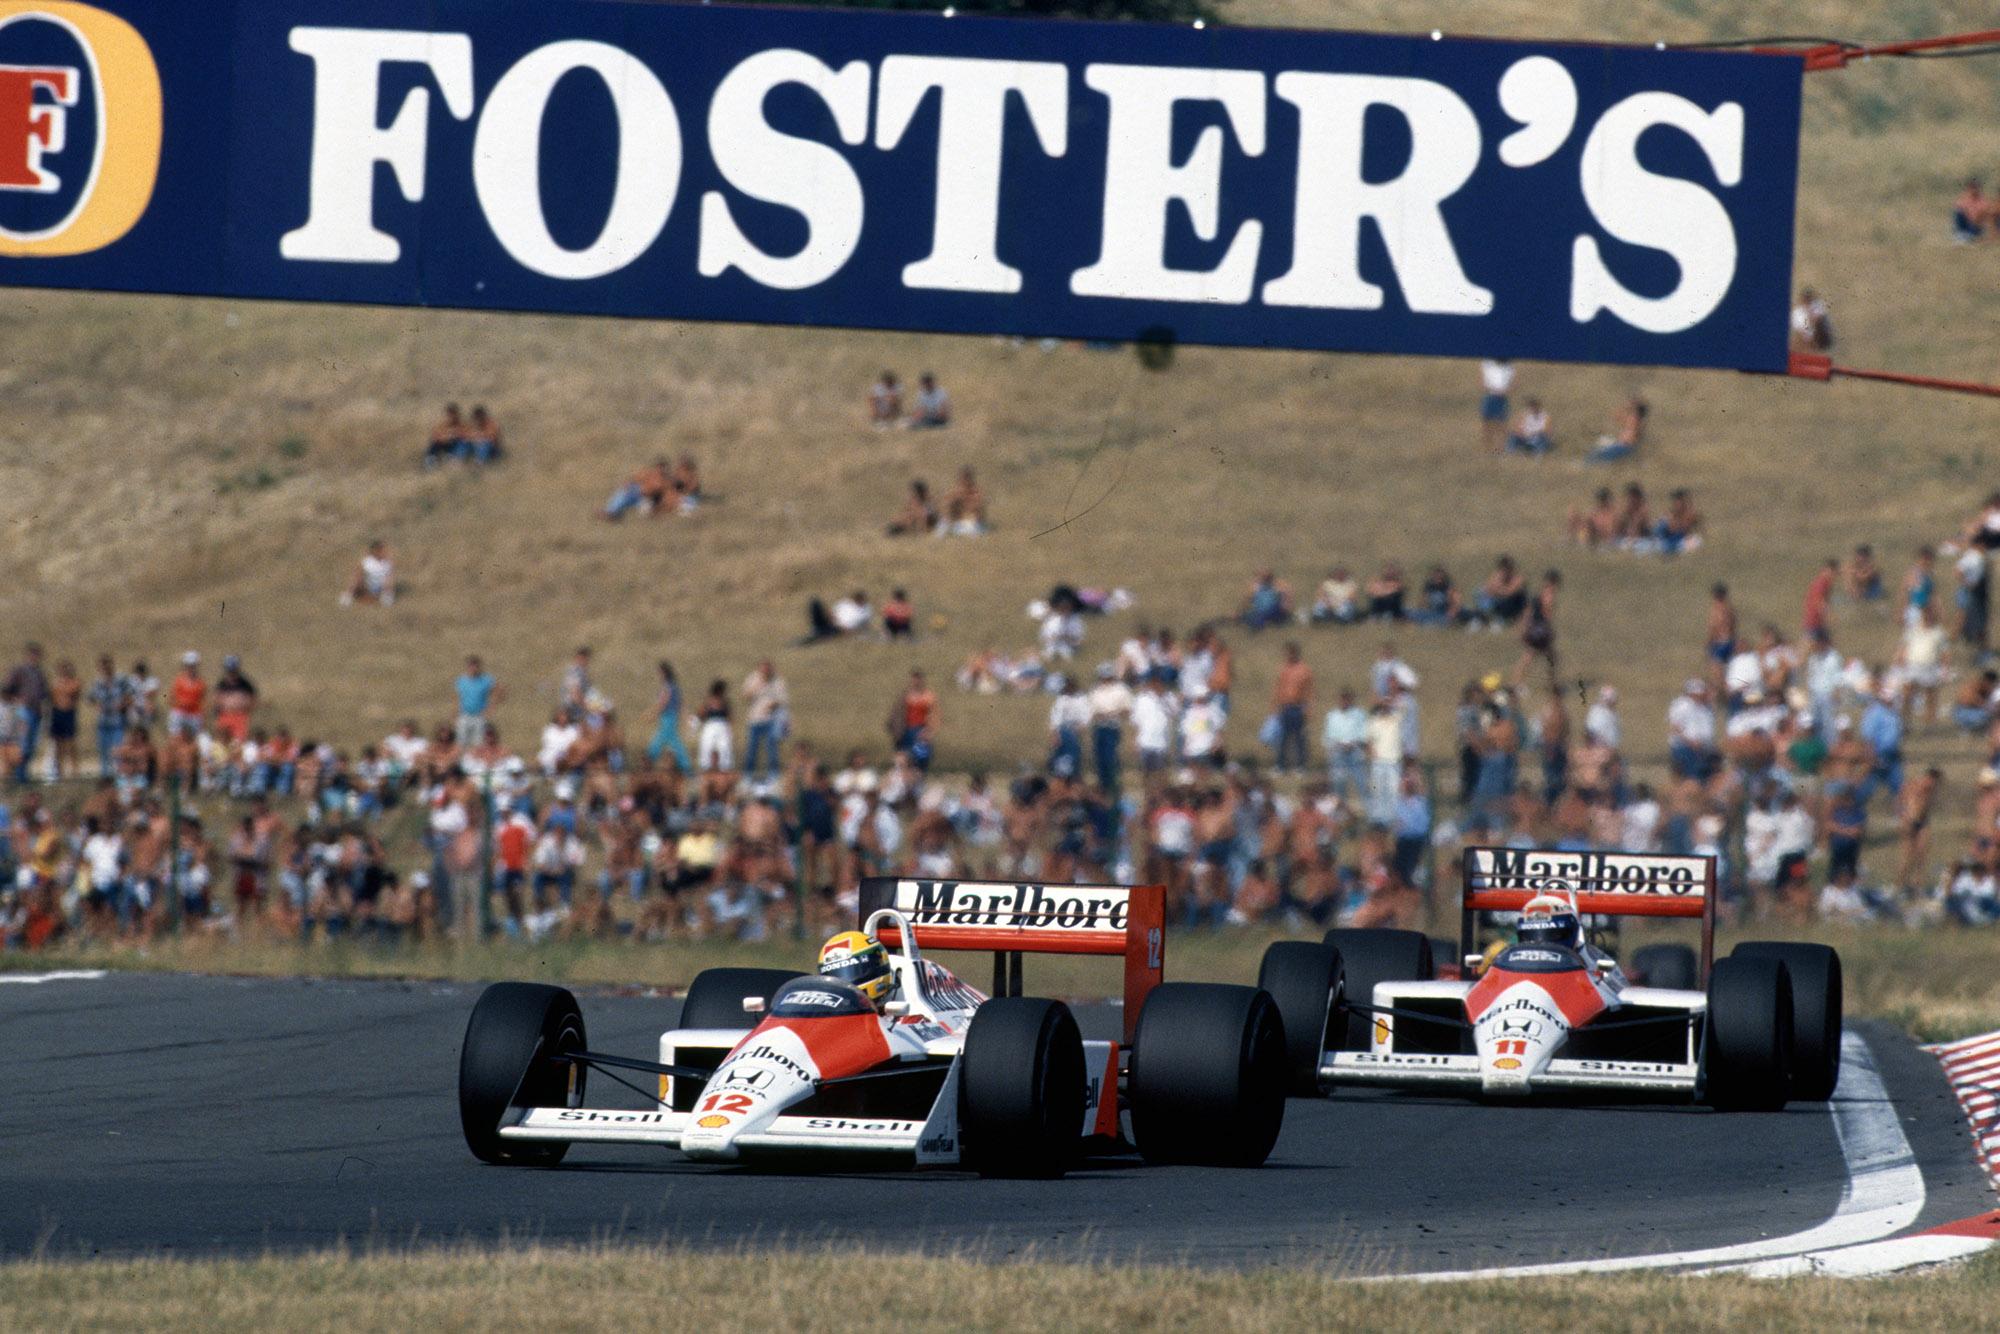 Ayrton Senna and Alain Prost in the 1988 McLaren-Honda MP4/4